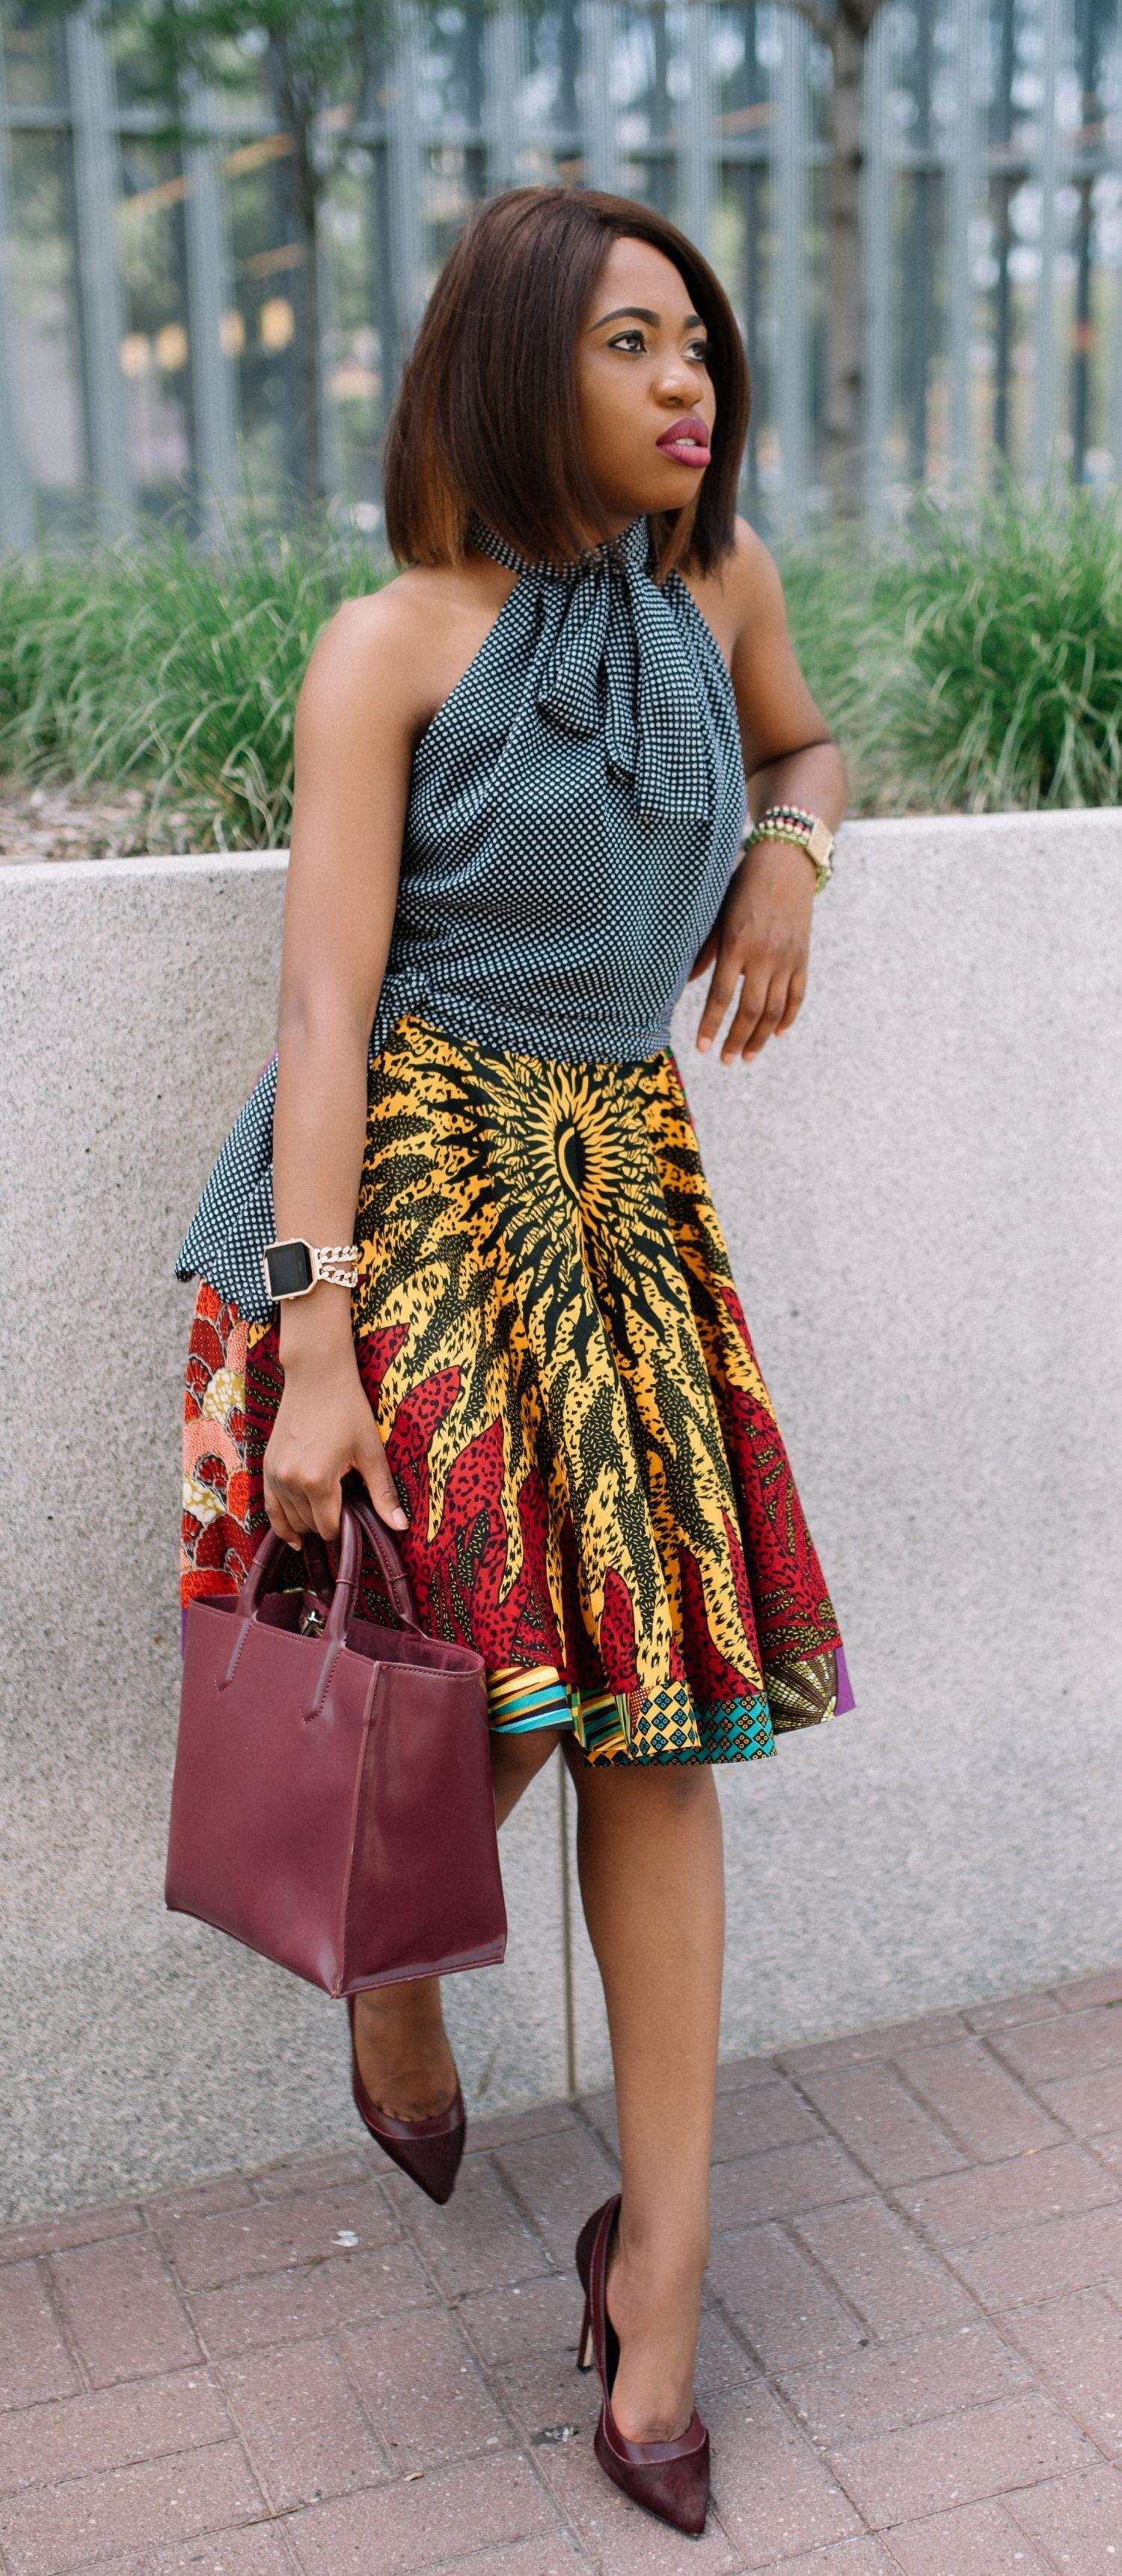 Ankara short dresses style fuste pinterest rochii și croitorie